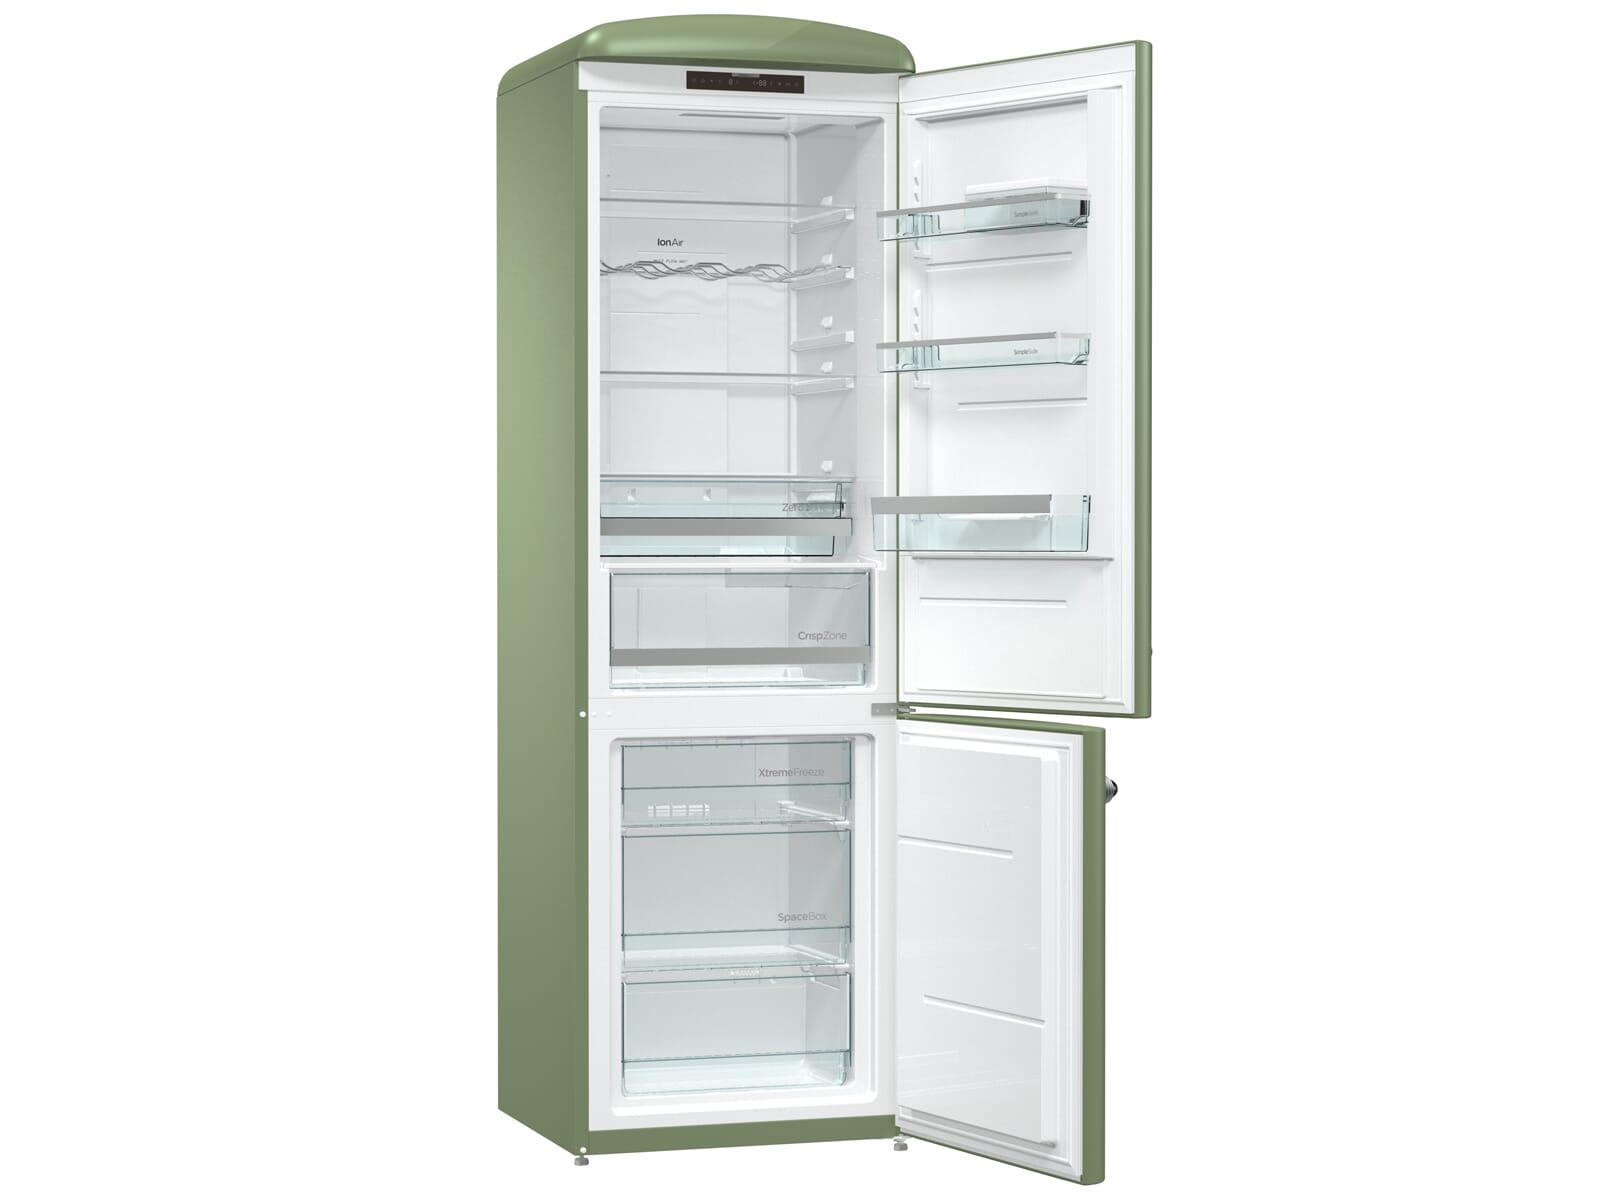 Gorenje Kühlschrank Abtauen : Gorenje retro kühlschrank abtauen gefrierschrank abtauen u so